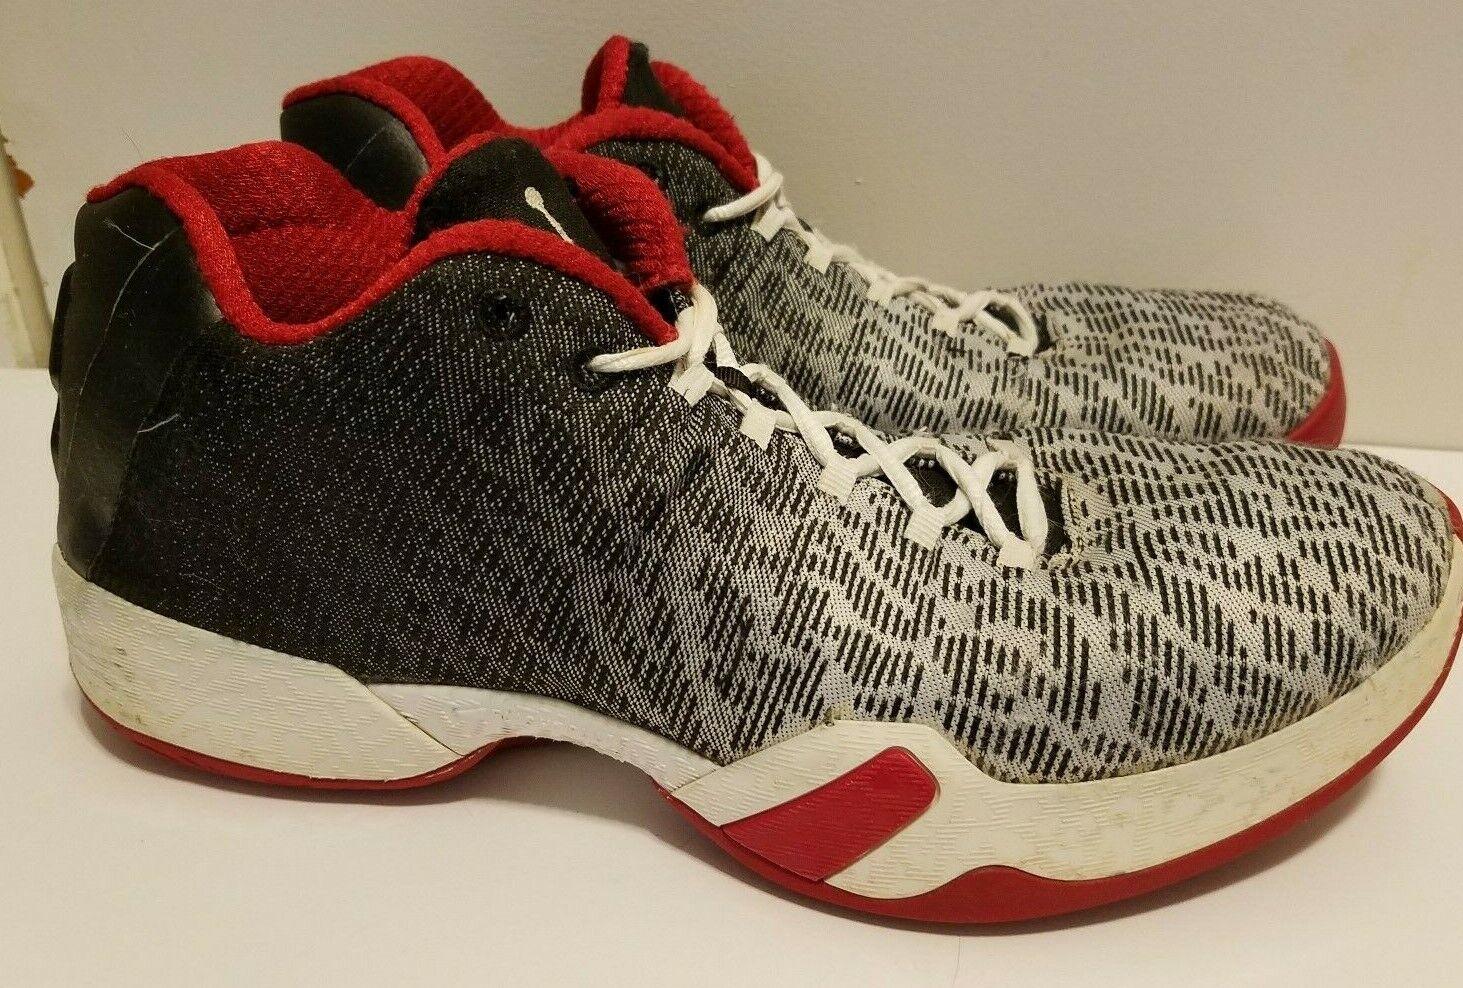 Nike Air Jordan xx9 Lows Black & Red shoes Basketball Men's sz 10.5 828051-101